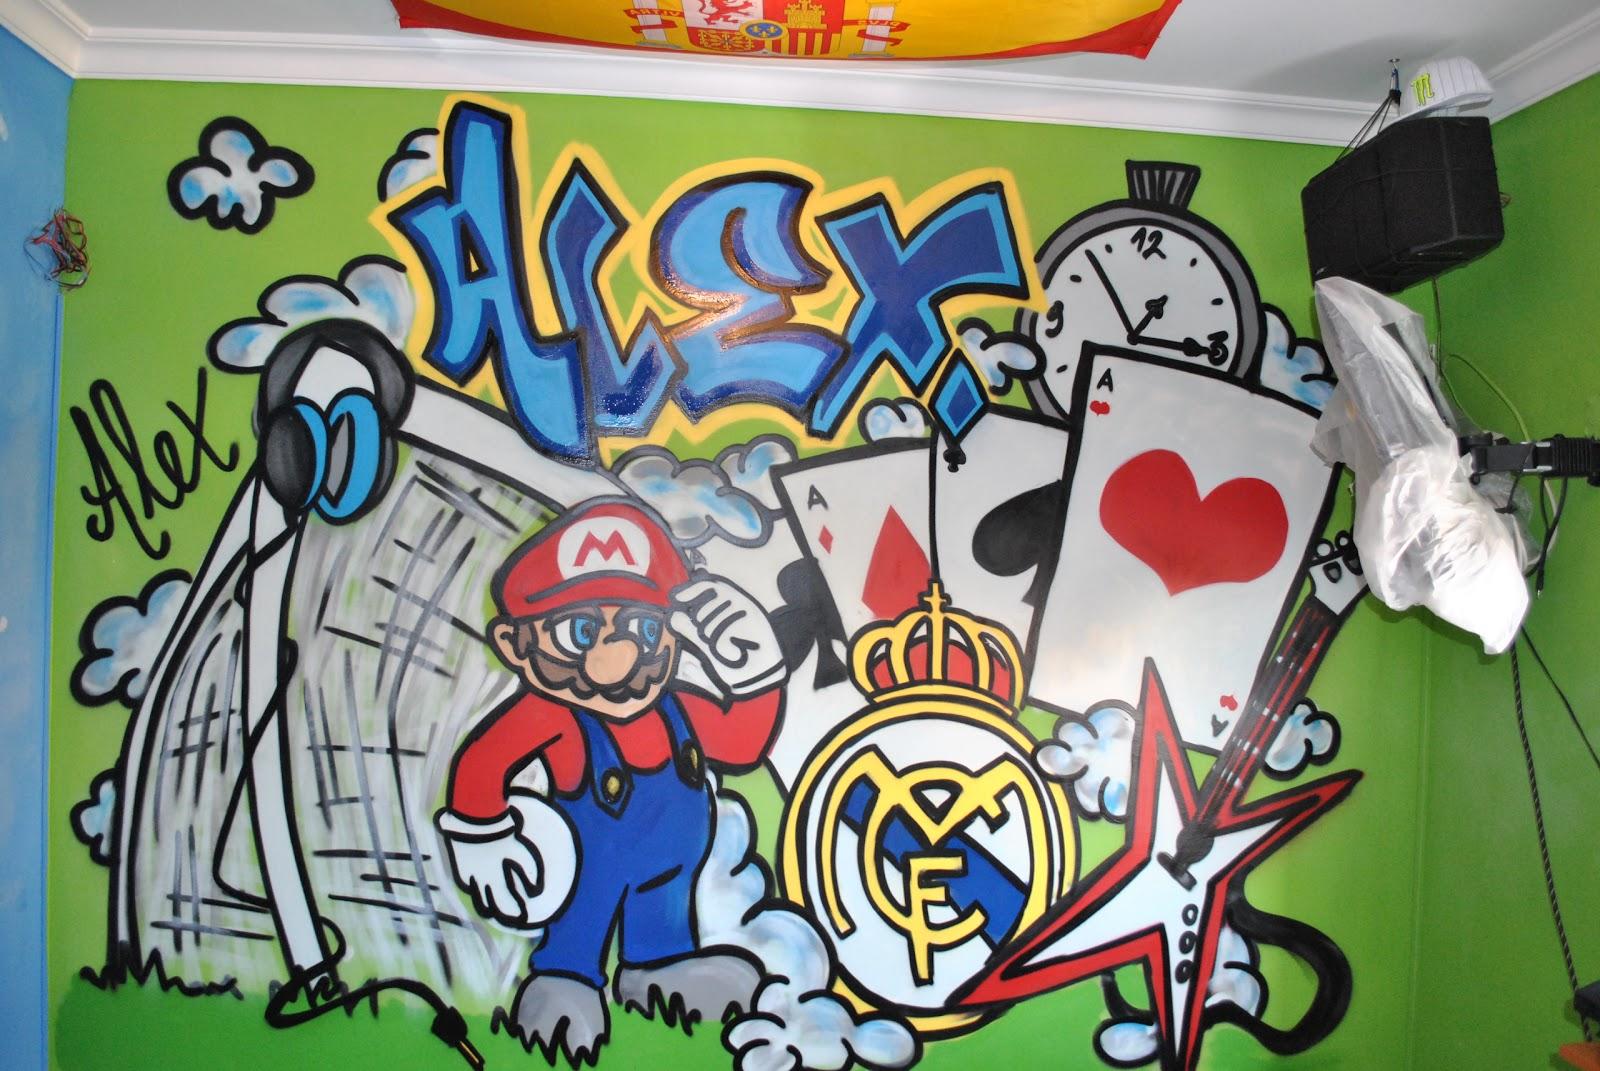 Decora graffitis cuarto - Graffitis para habitaciones ...